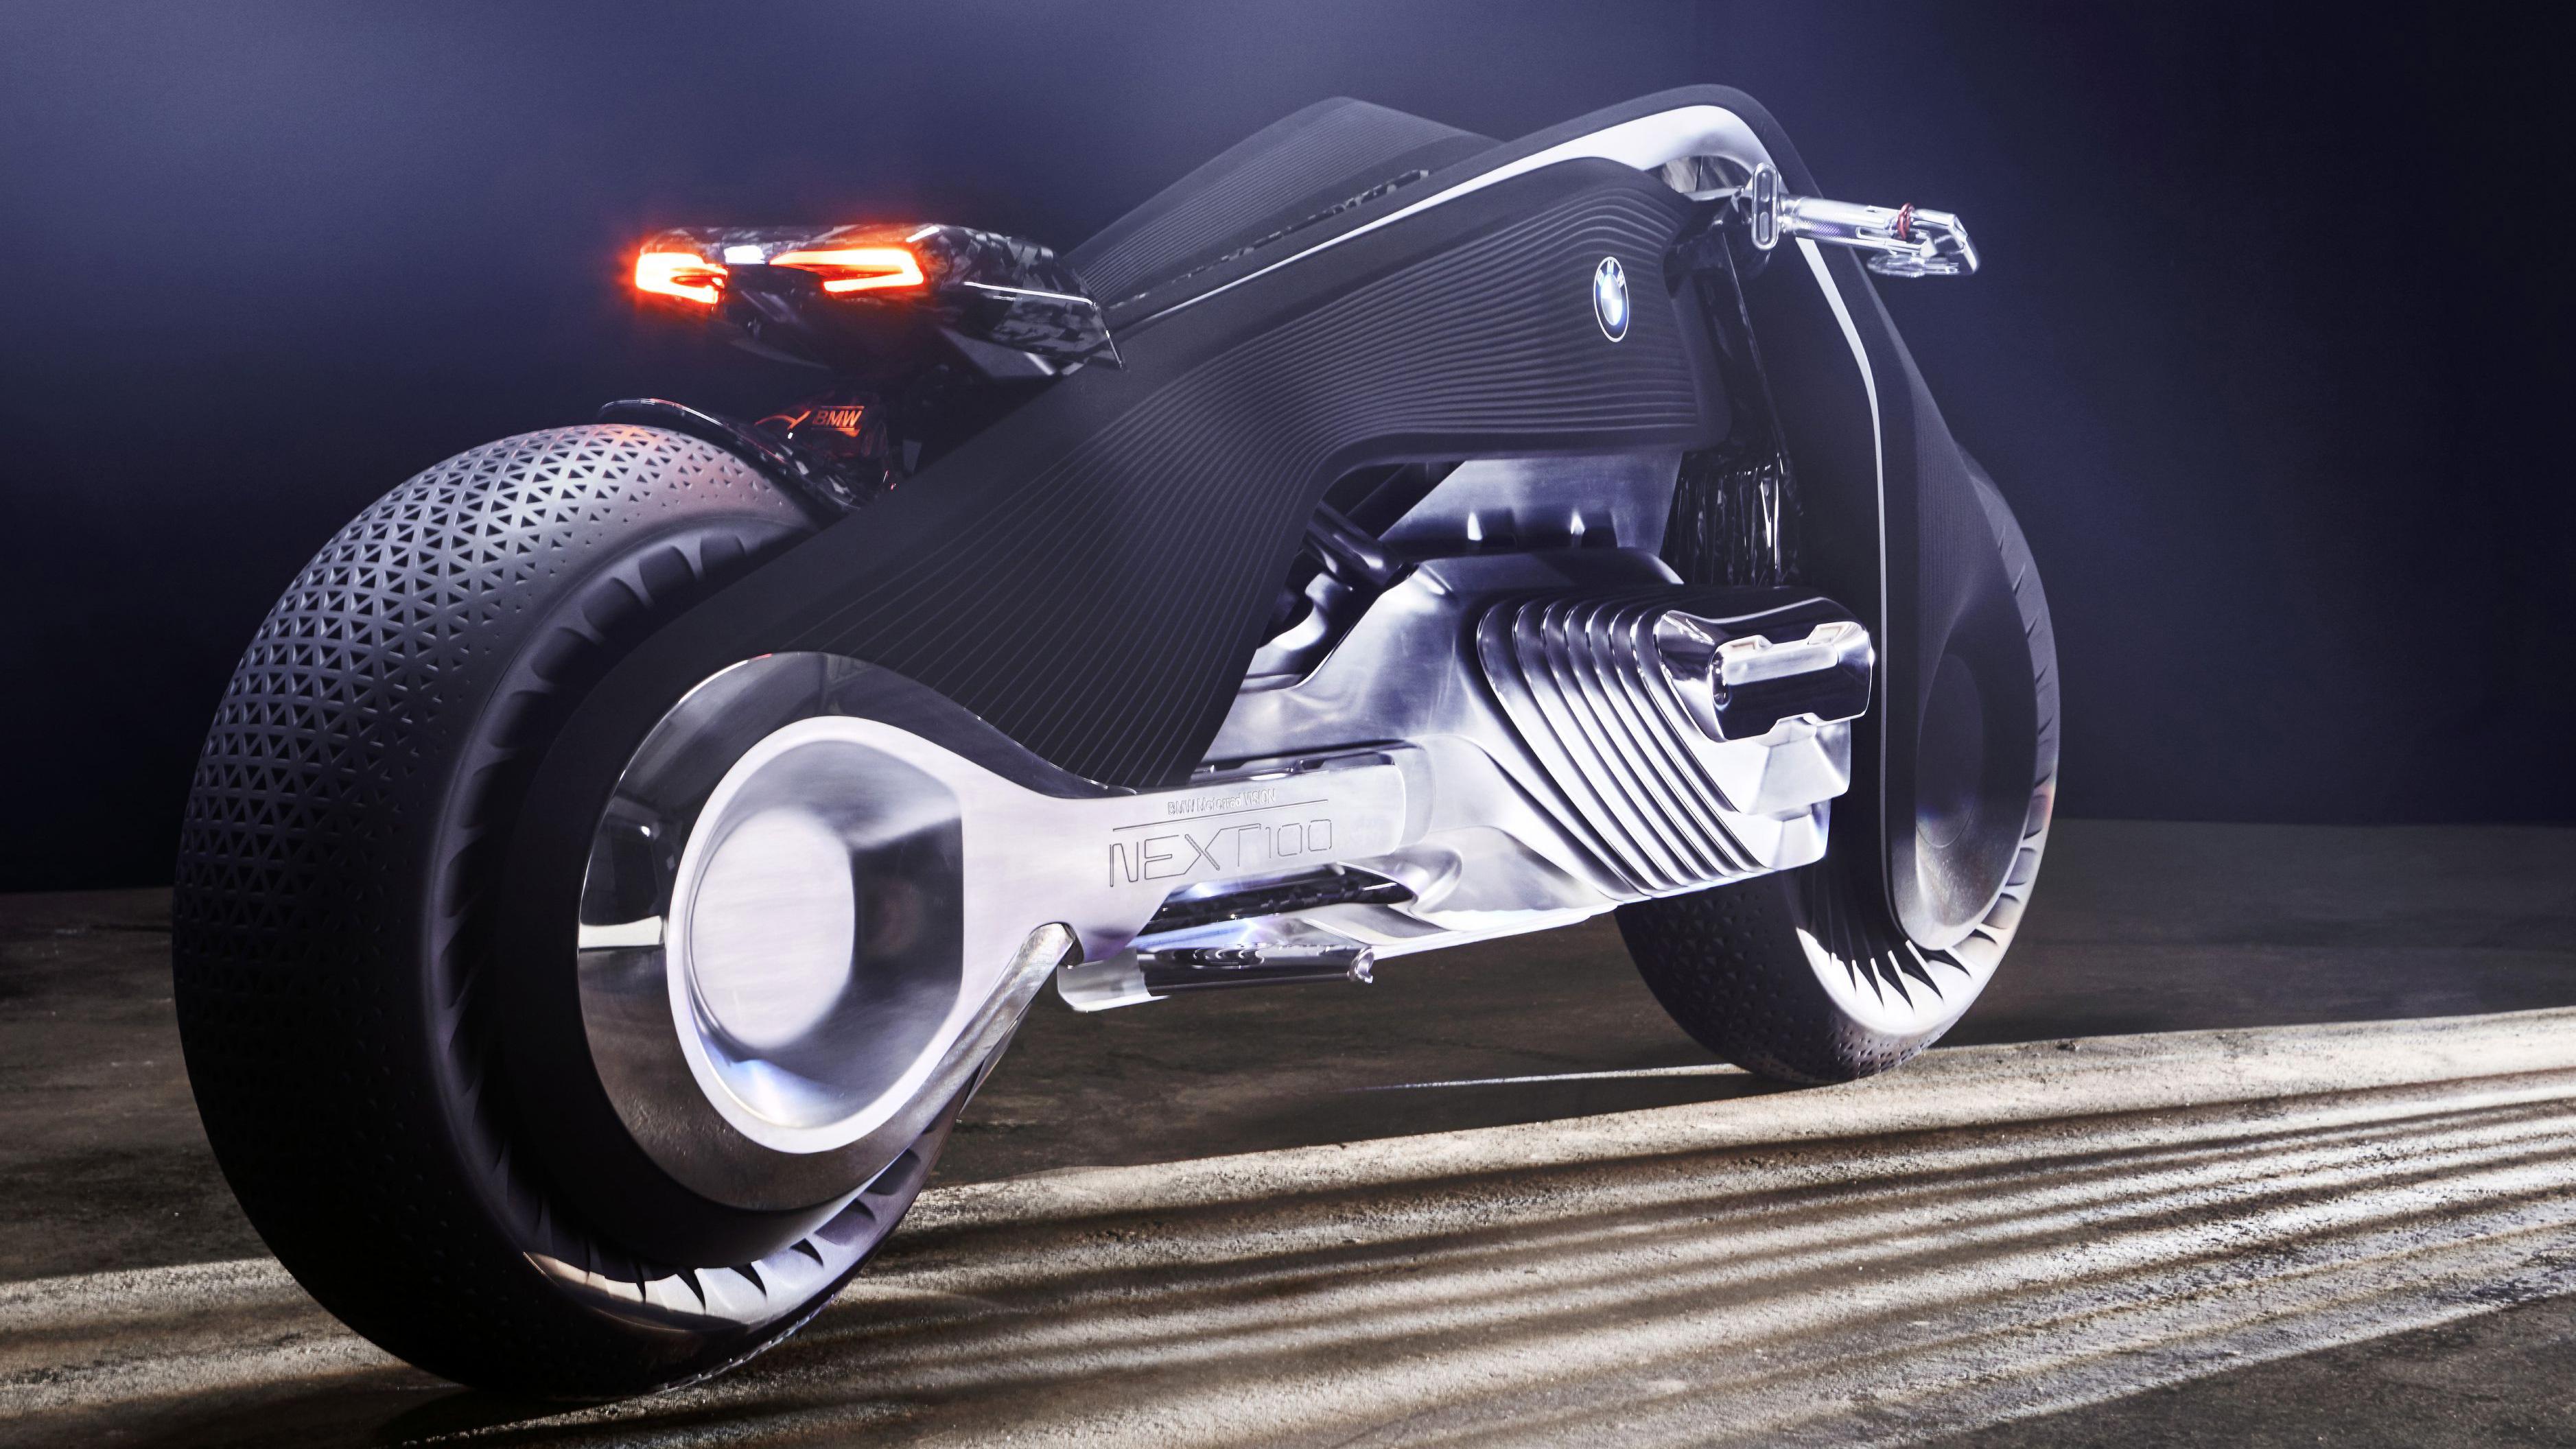 Bmw Motorrad Vision Next 100 4k Wallpaper Hd Car Wallpapers Id 7091